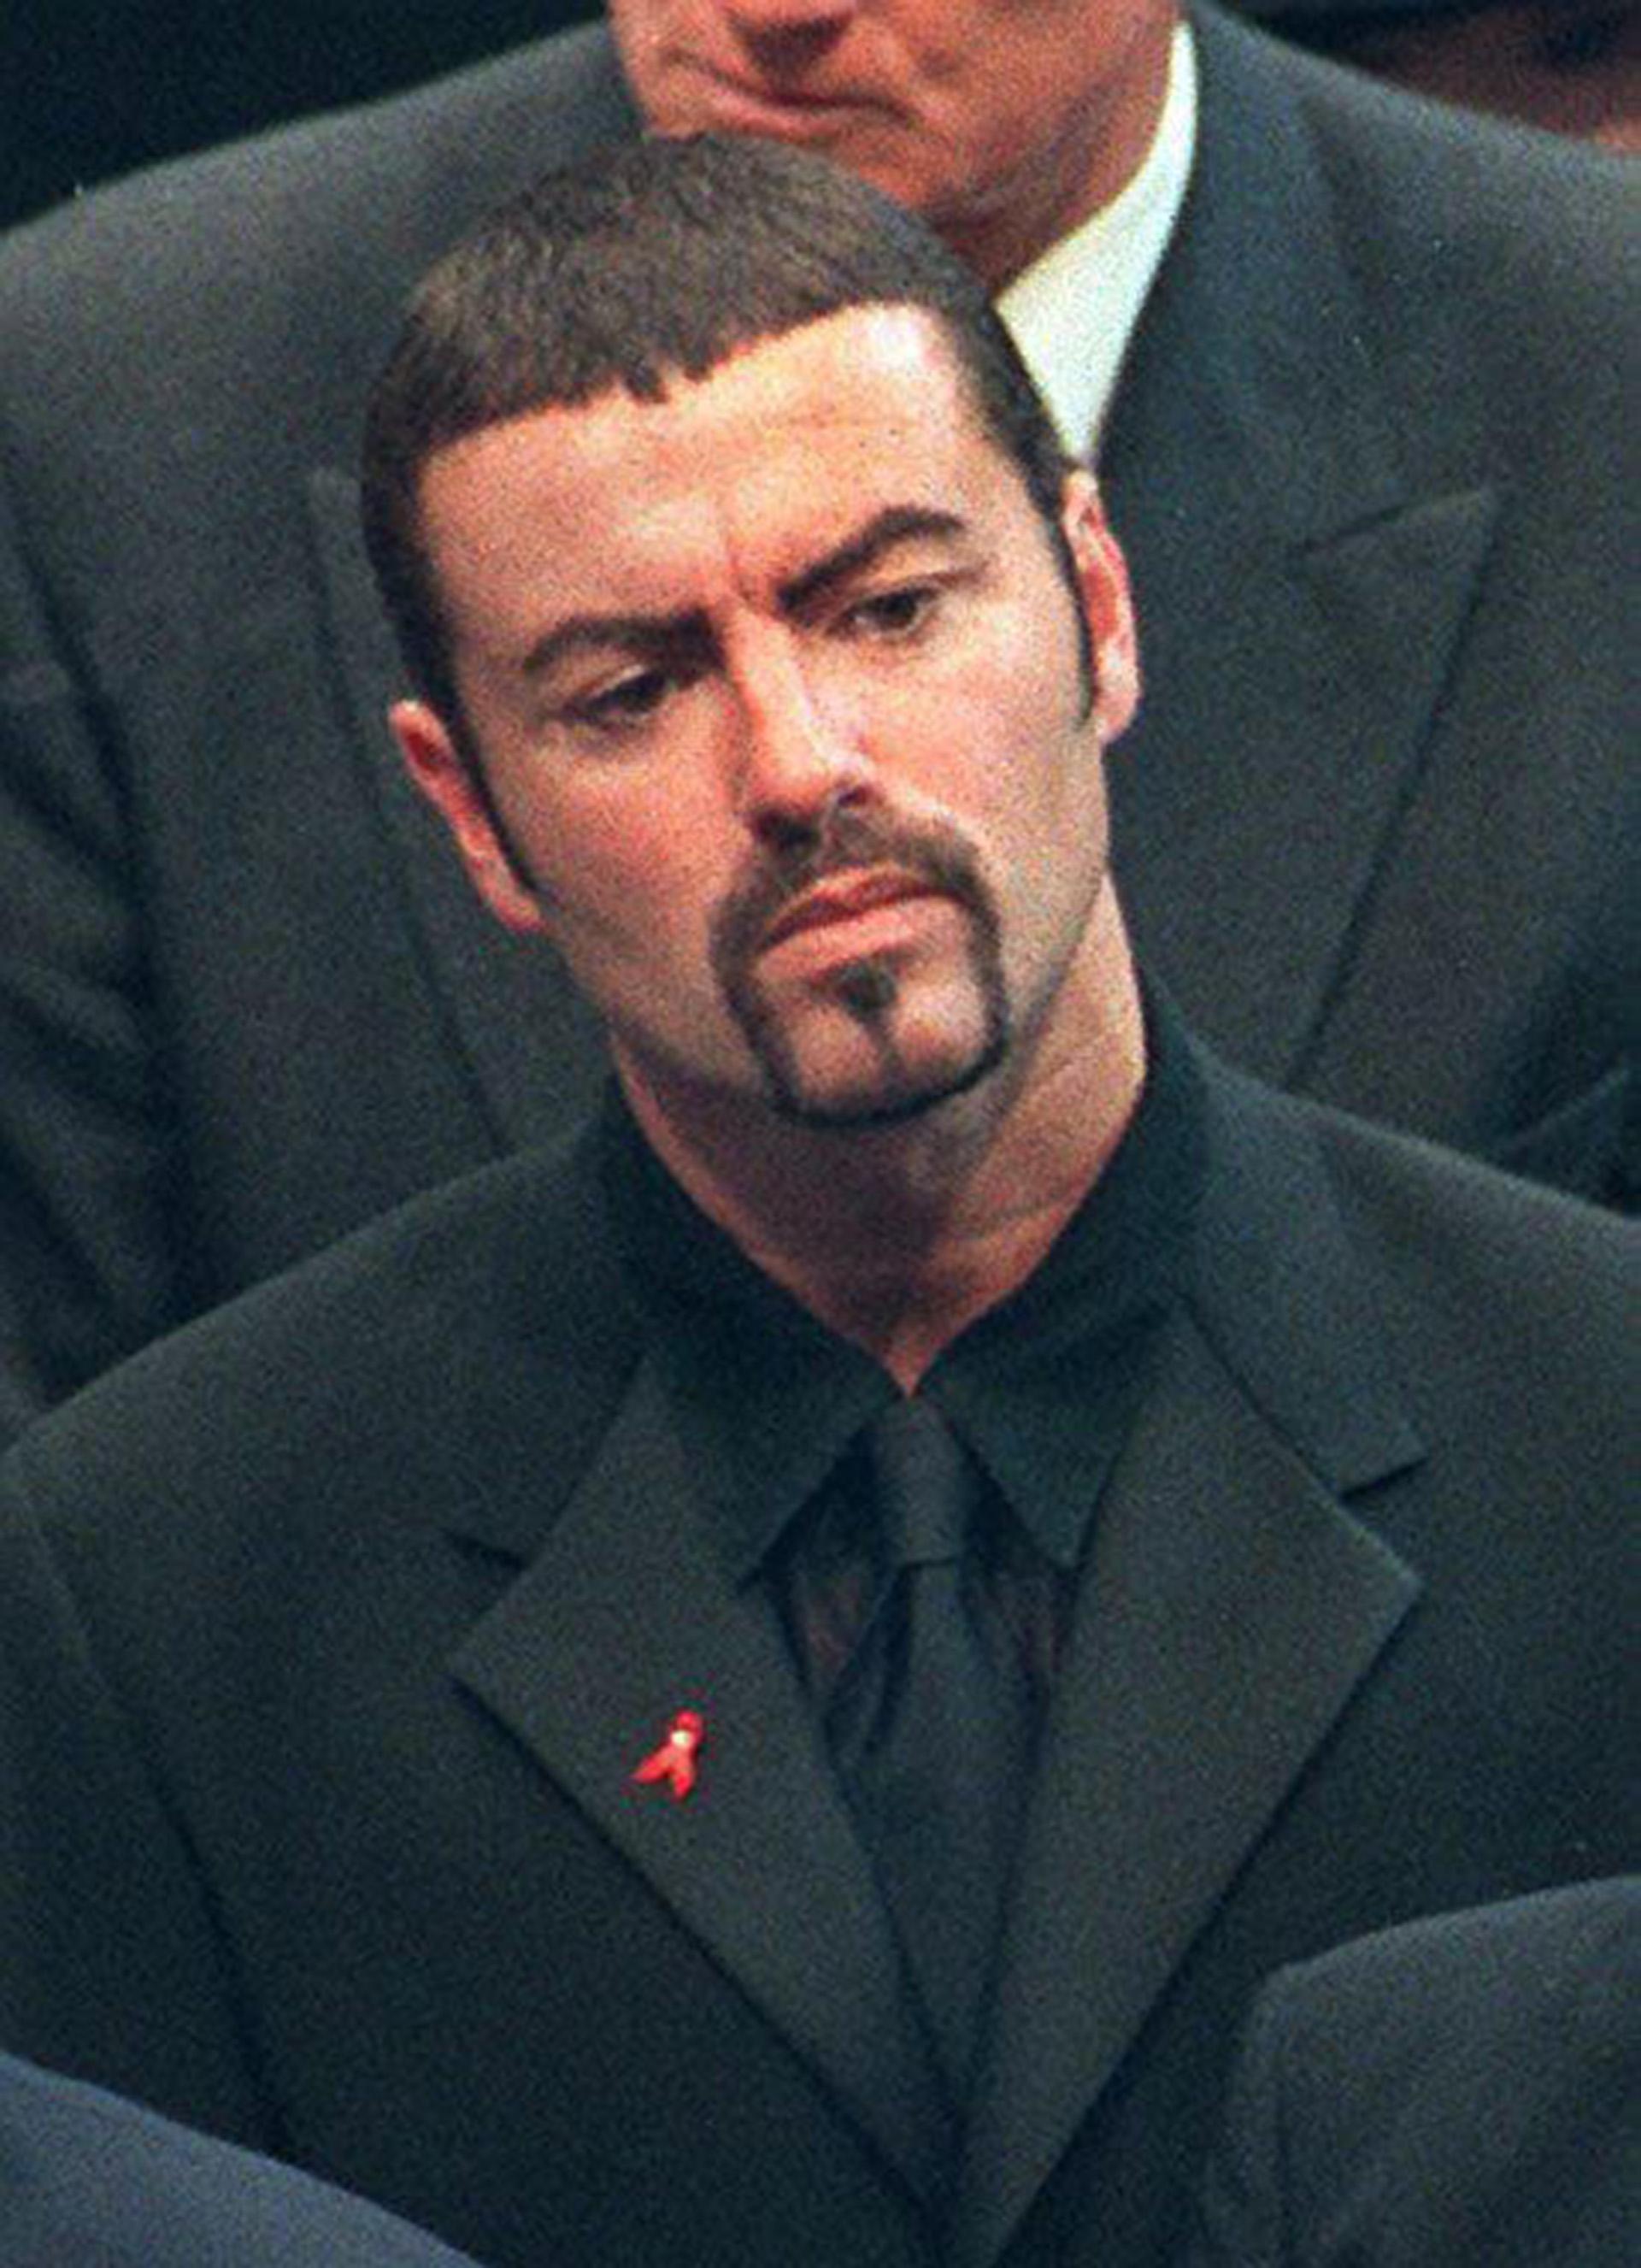 George Michael, en septiembre de 1997 (AFP)